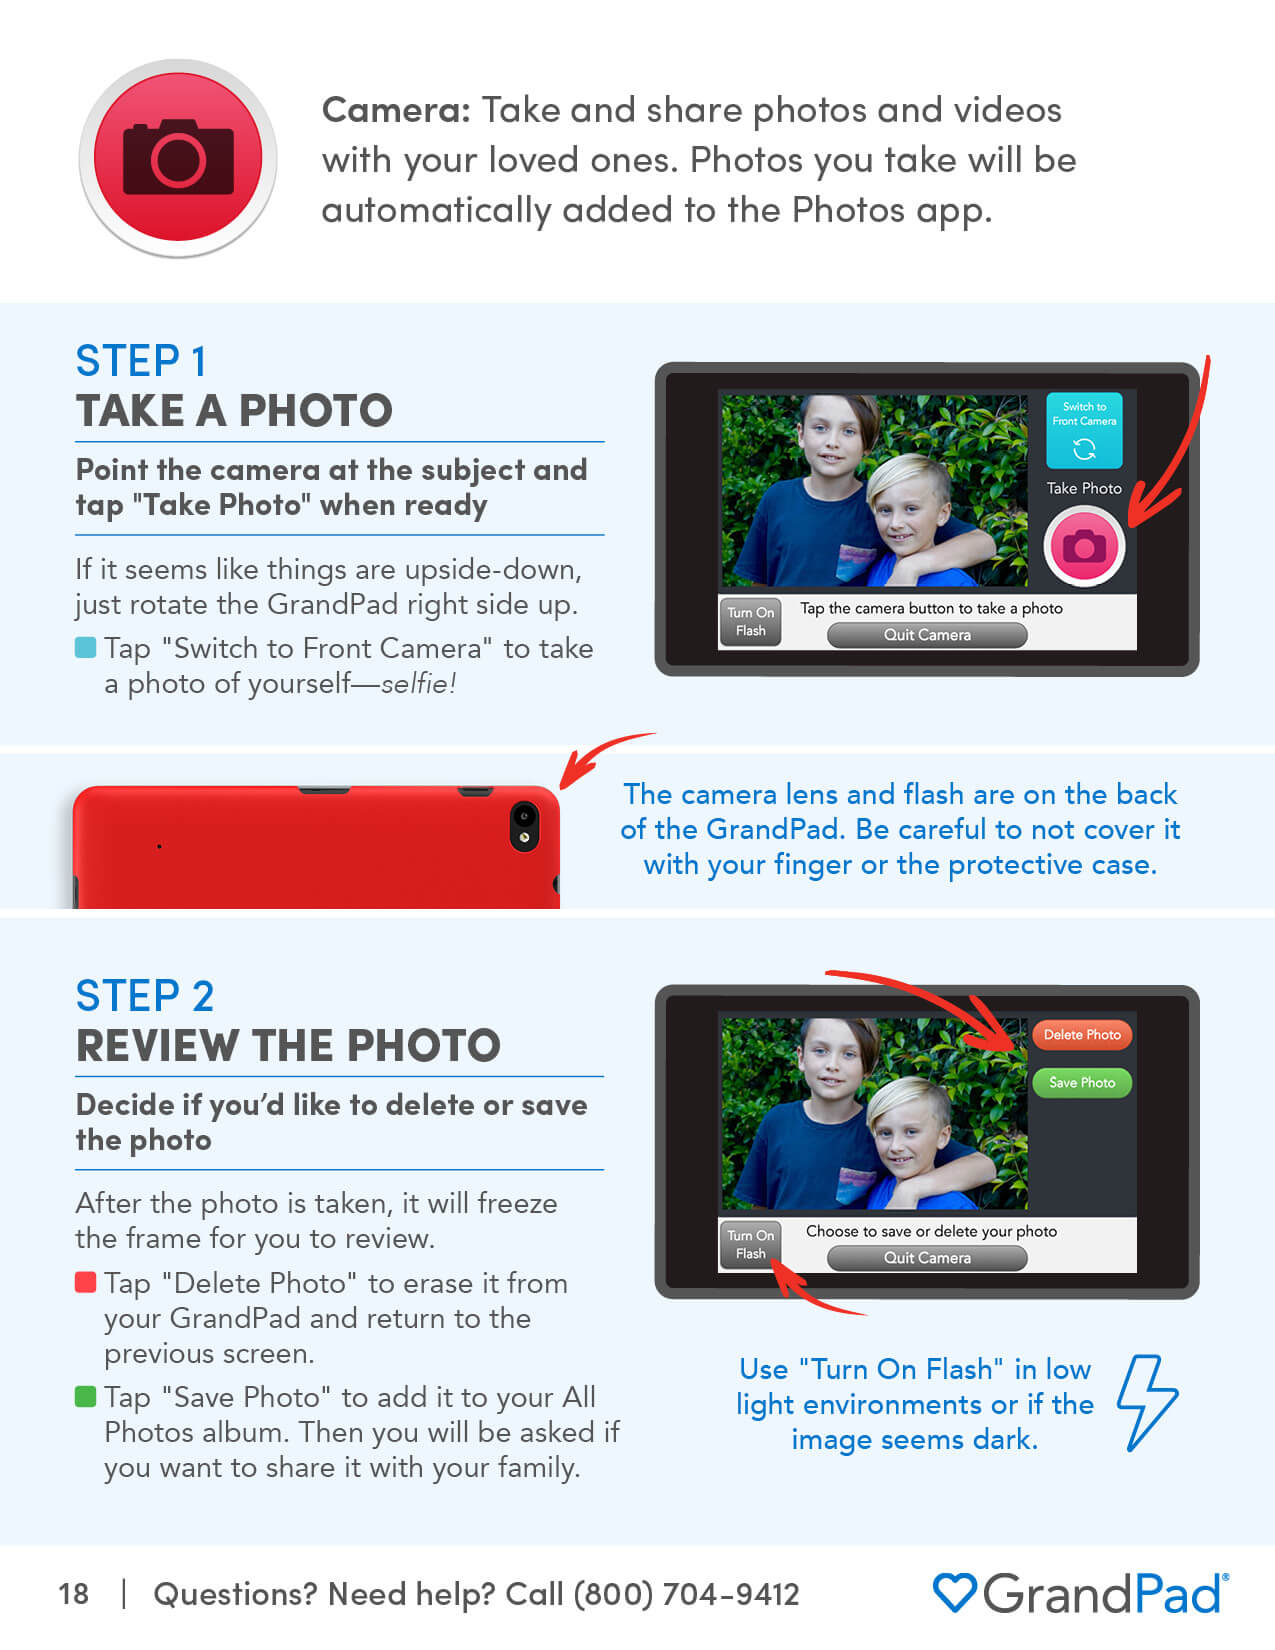 Instruction on using the Camera app